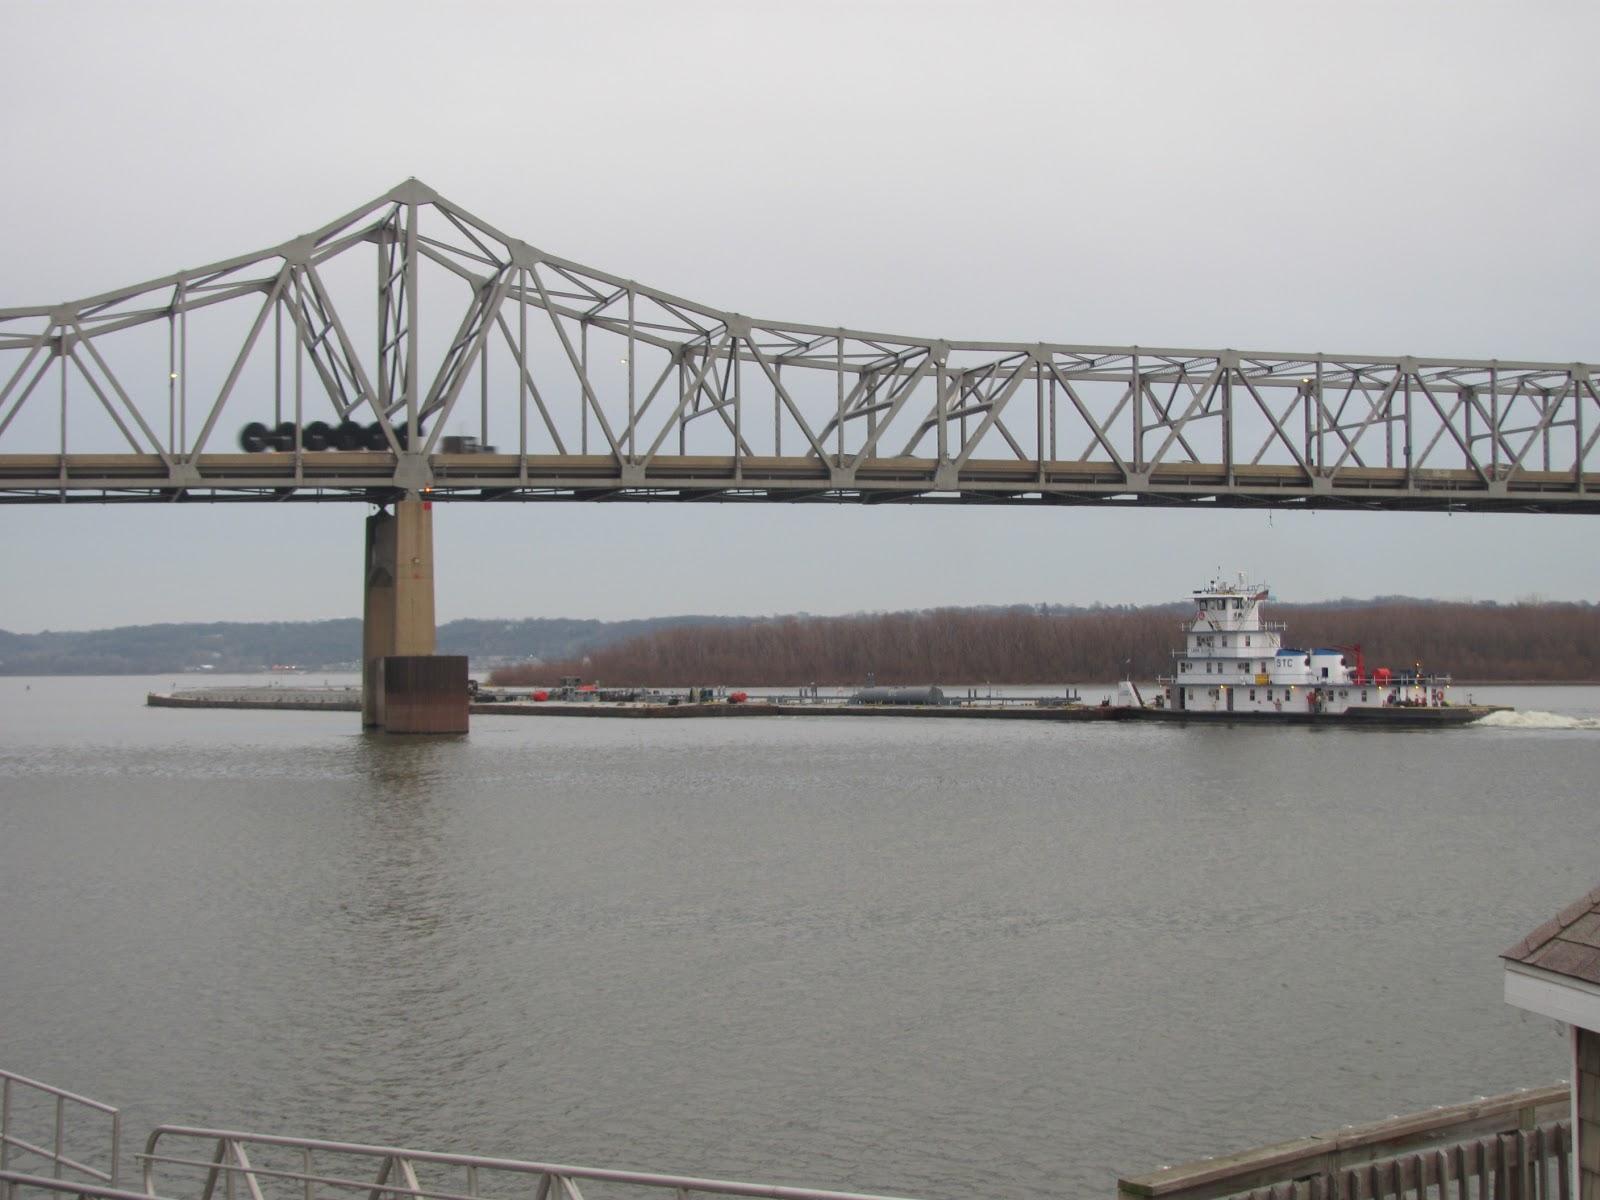 Shuttering For Bridges : Lensing and shuttering semi on bridge towboat pushing